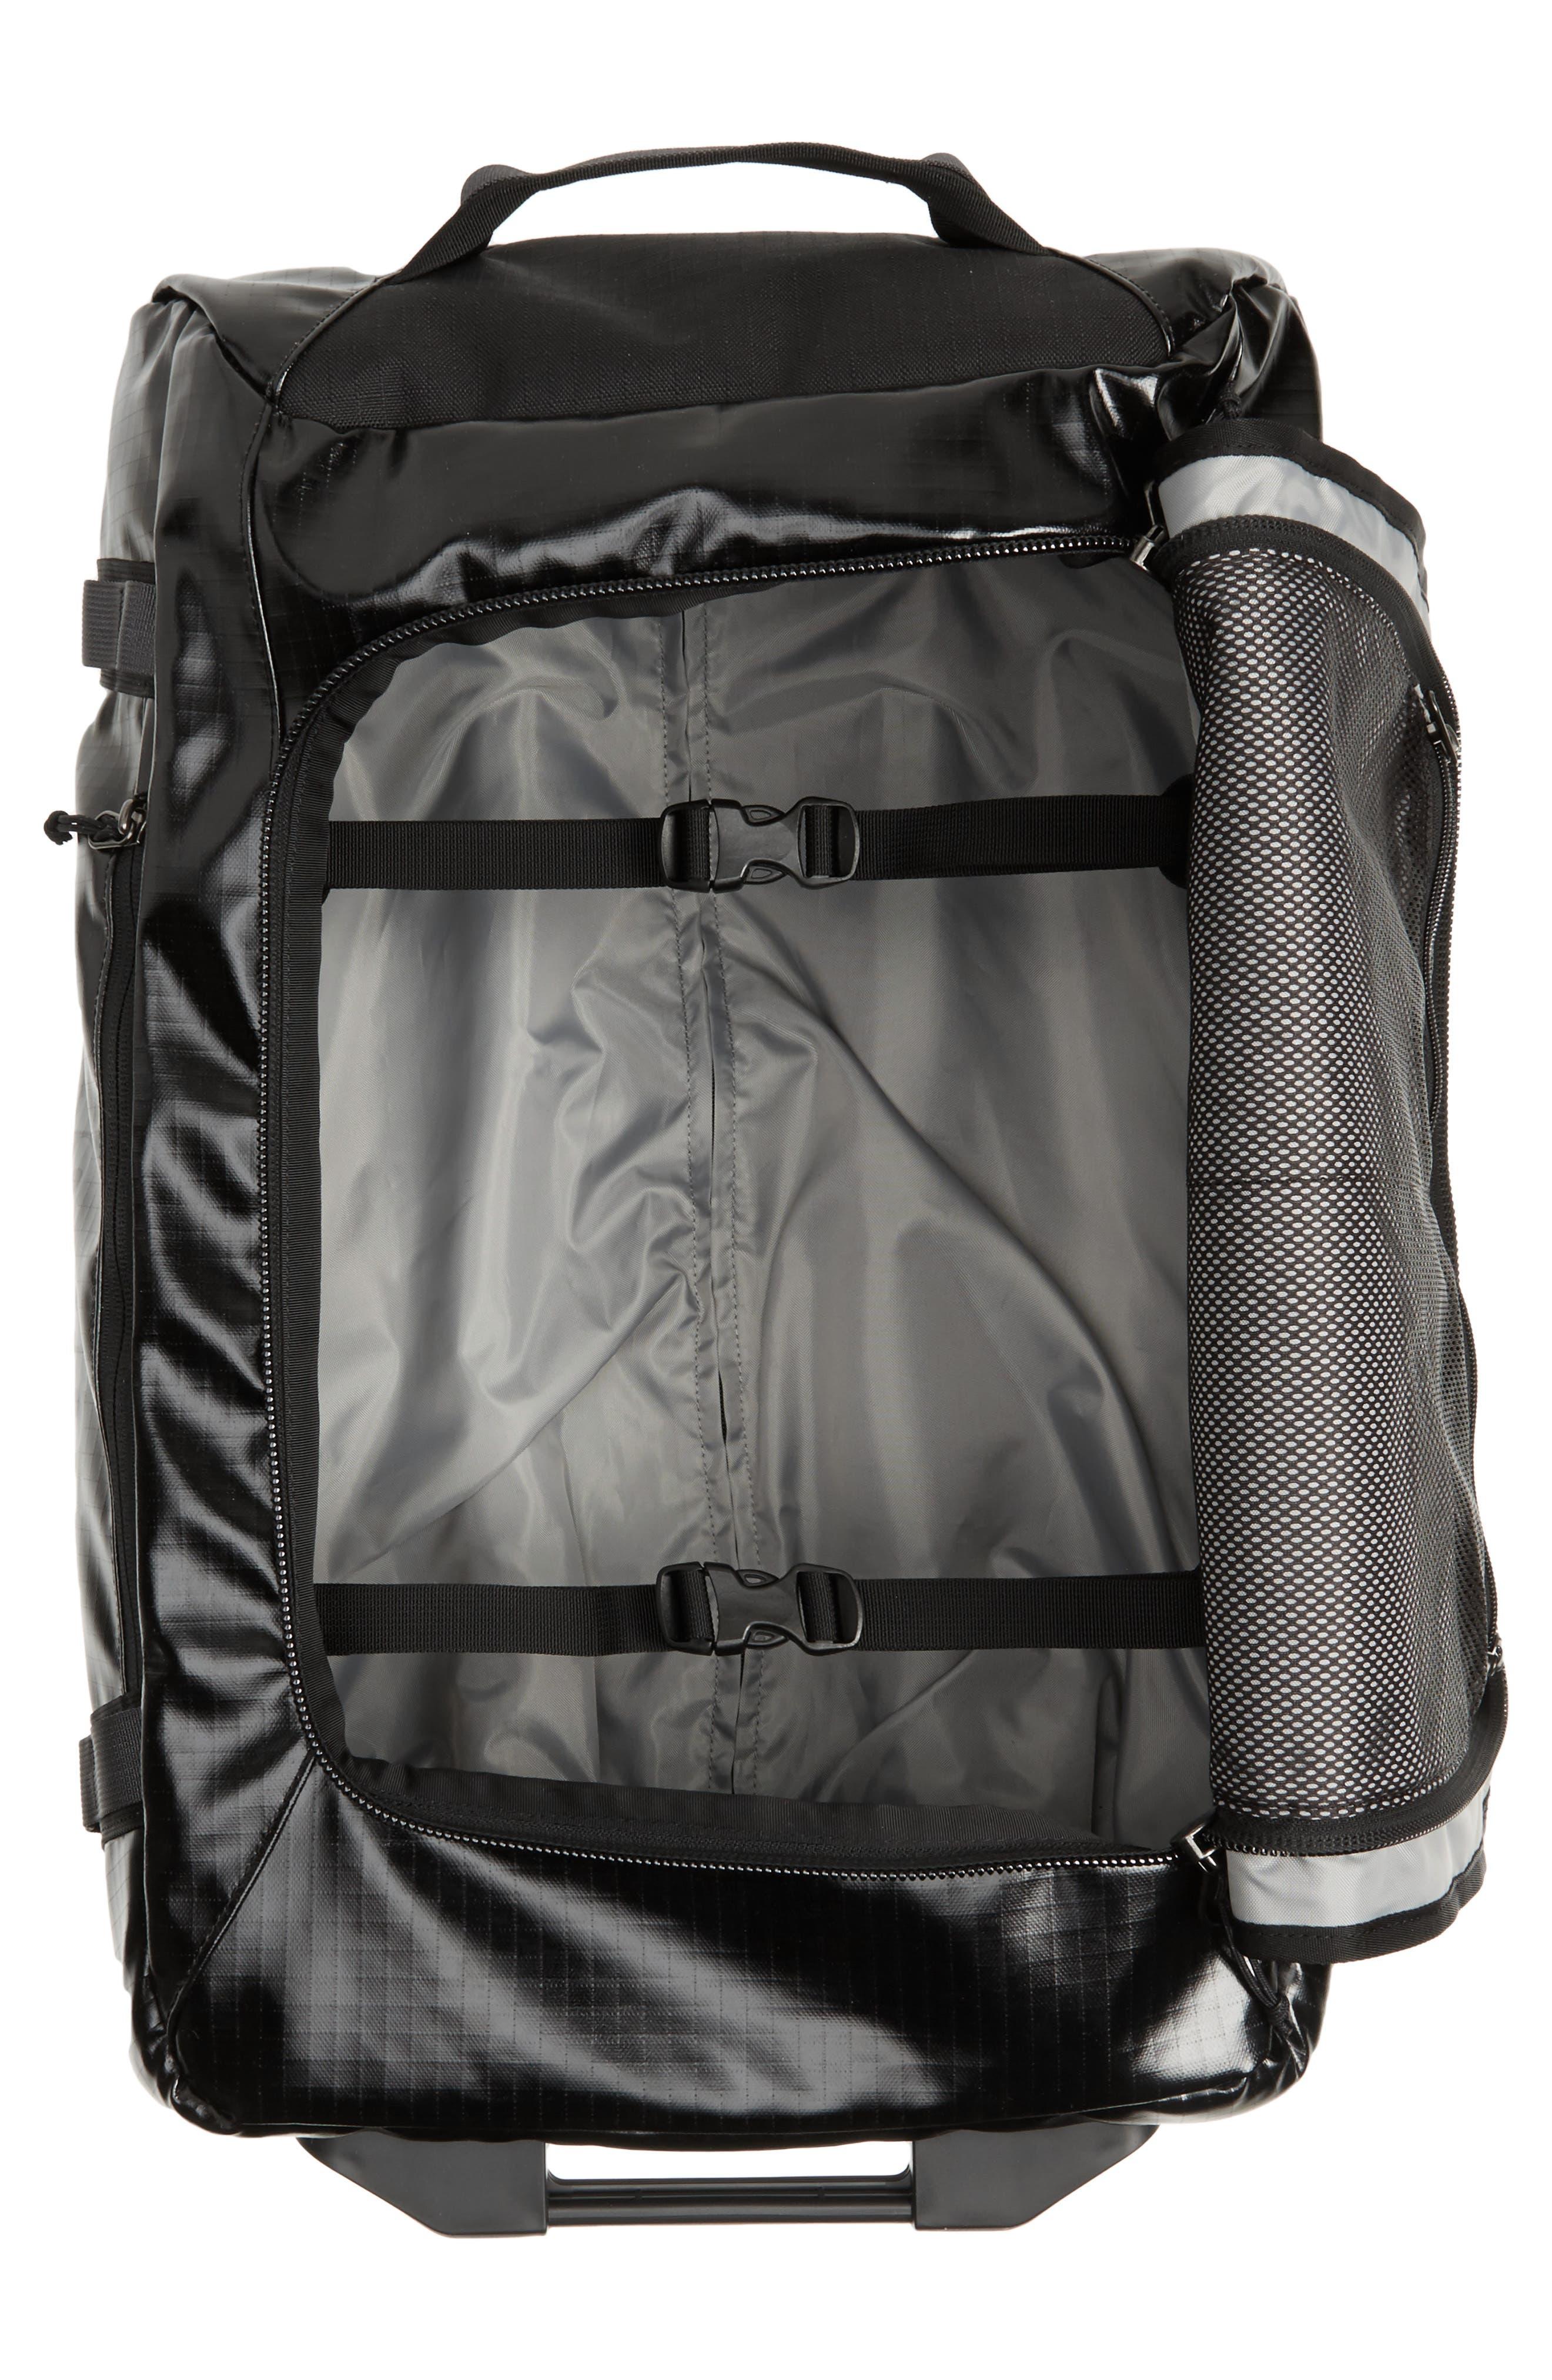 Black Hole 40-Liter Rolling Duffel Bag,                             Alternate thumbnail 2, color,                             001